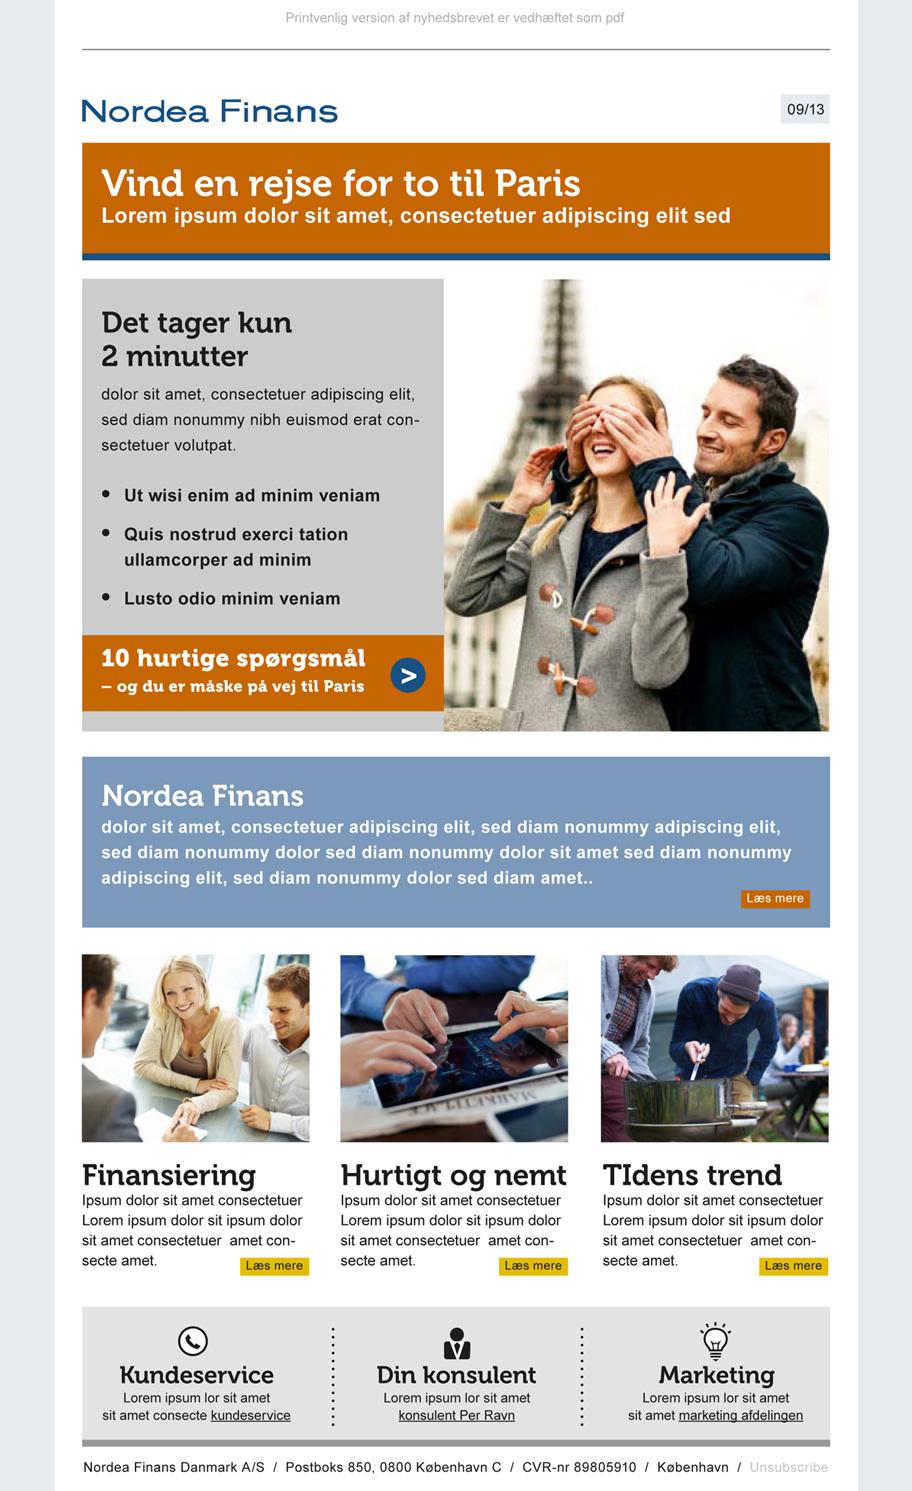 Nordea Finans nyhedsbrev